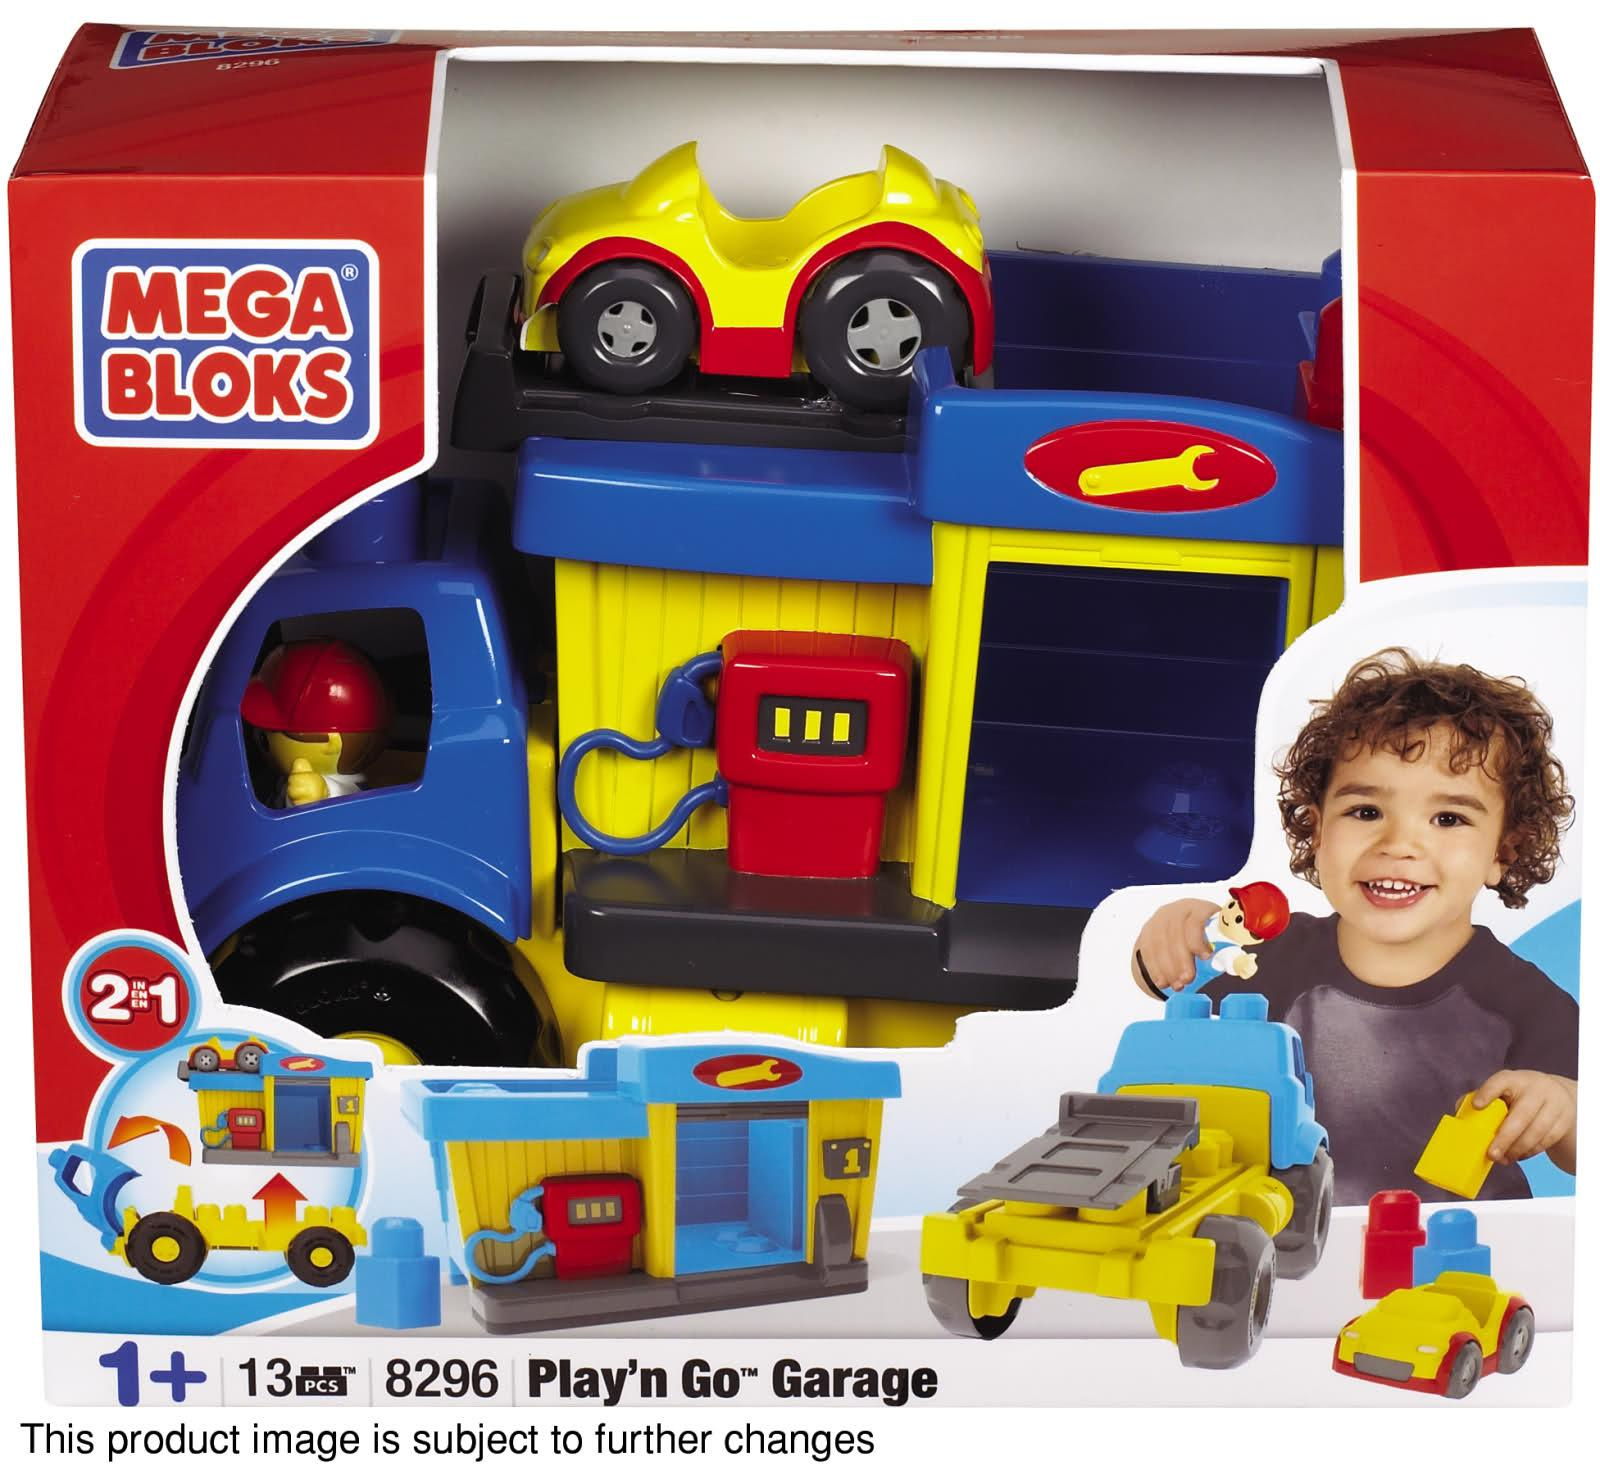 Mega Bloks Play'n Go Garage Toy Set